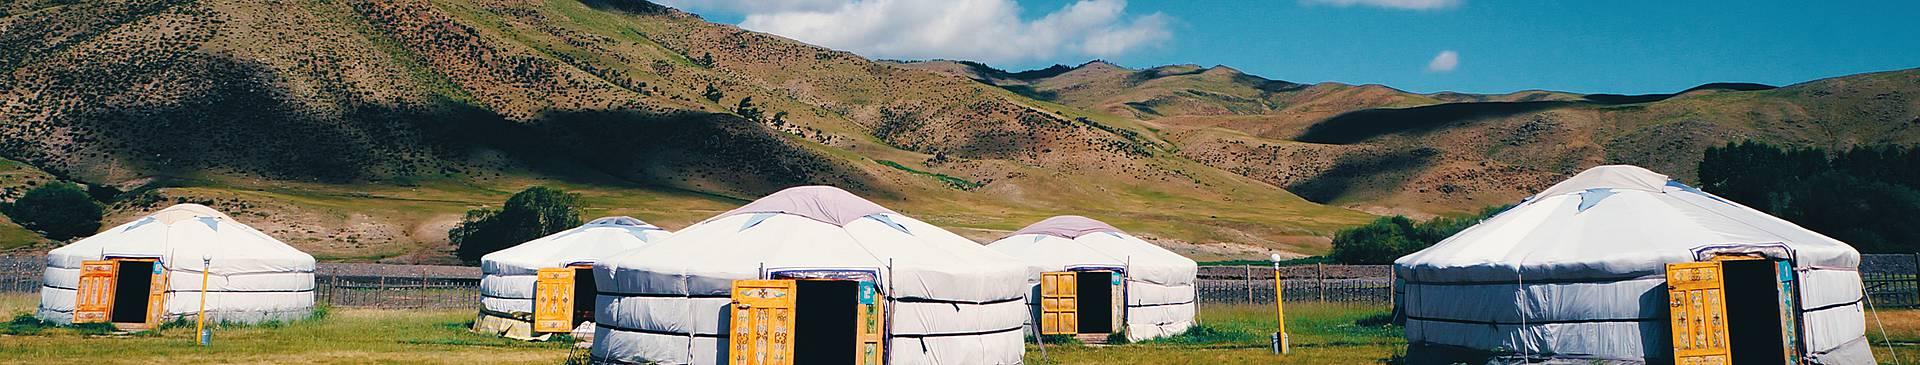 Viajes a Mongolia en primavera